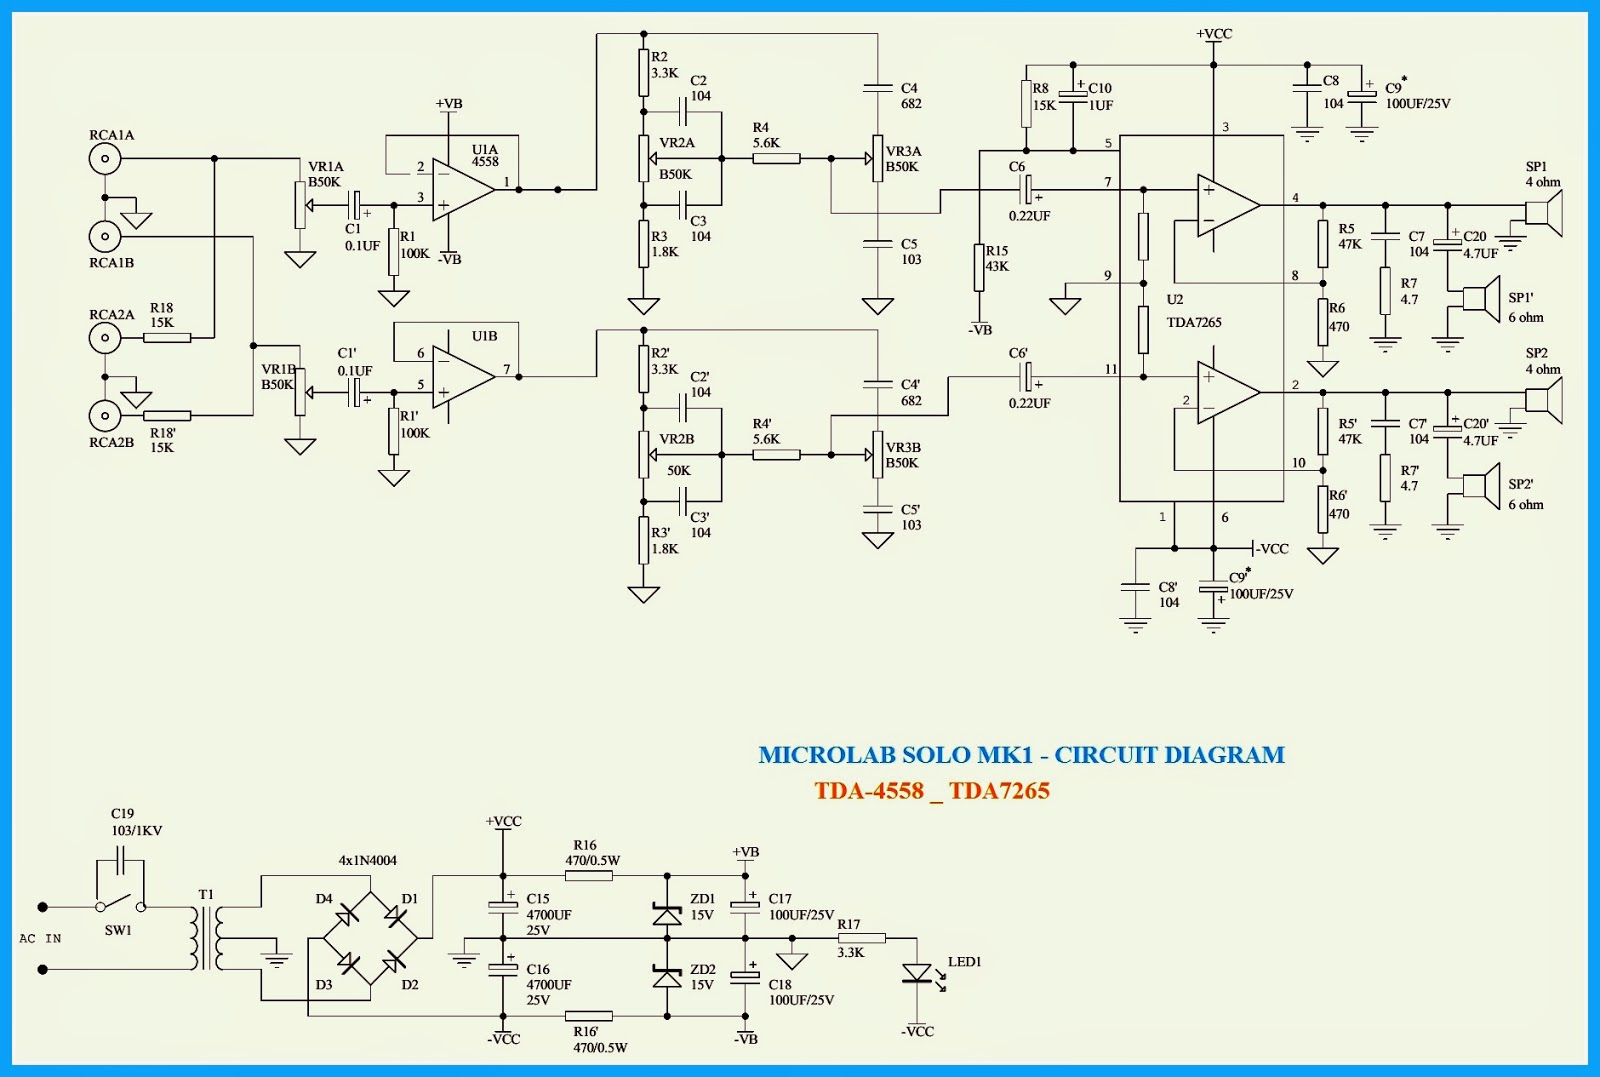 microlab m800 microlab solo1mk2 schematic computer